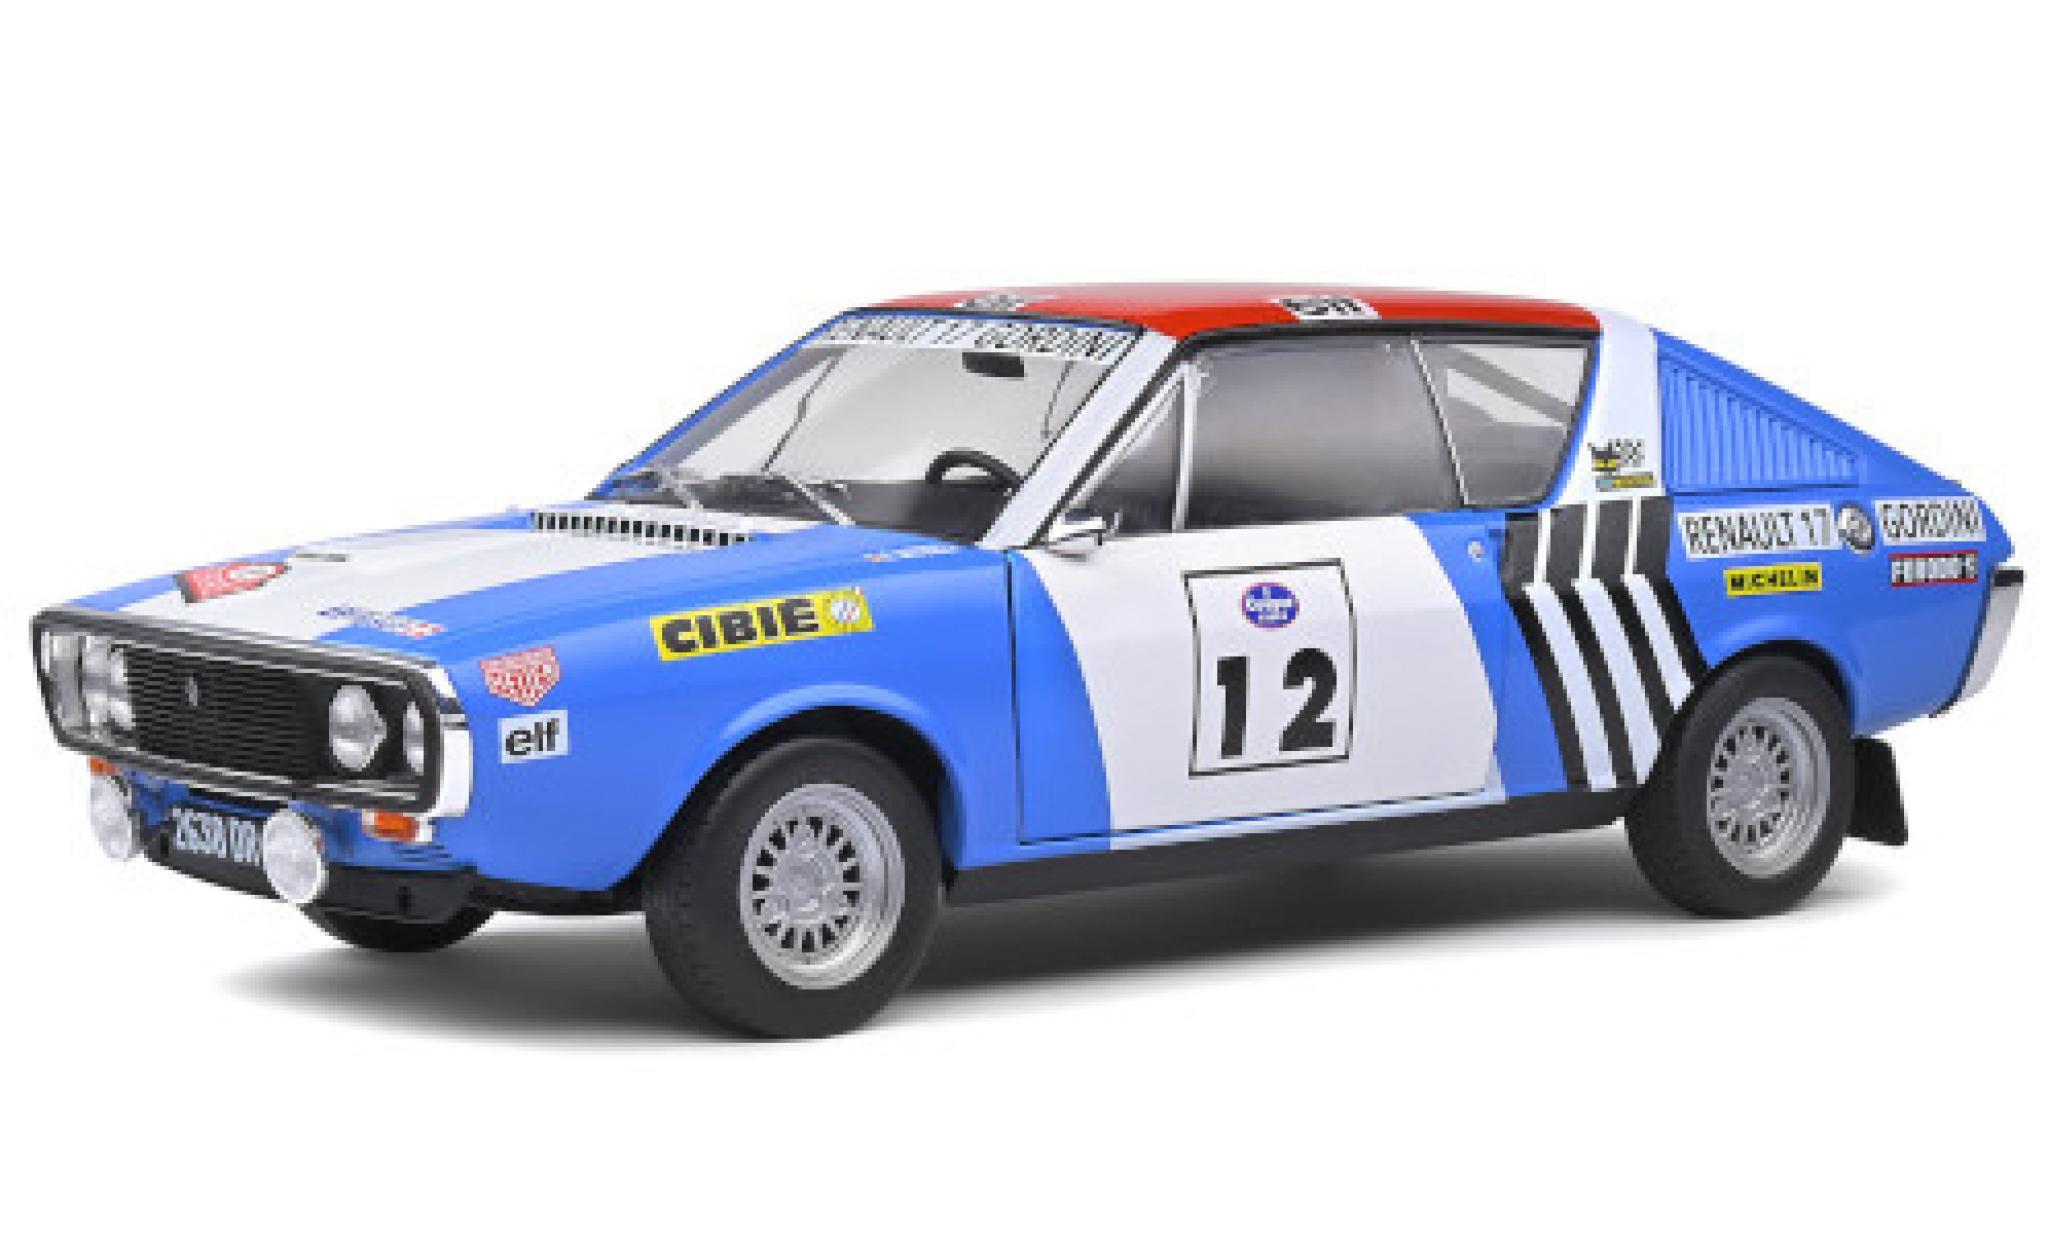 Renault 17 1/18 Solido Gordini No.12 Rallye WM Rallye Press on Regardless 1974 J-L.Therier/C.Delferier